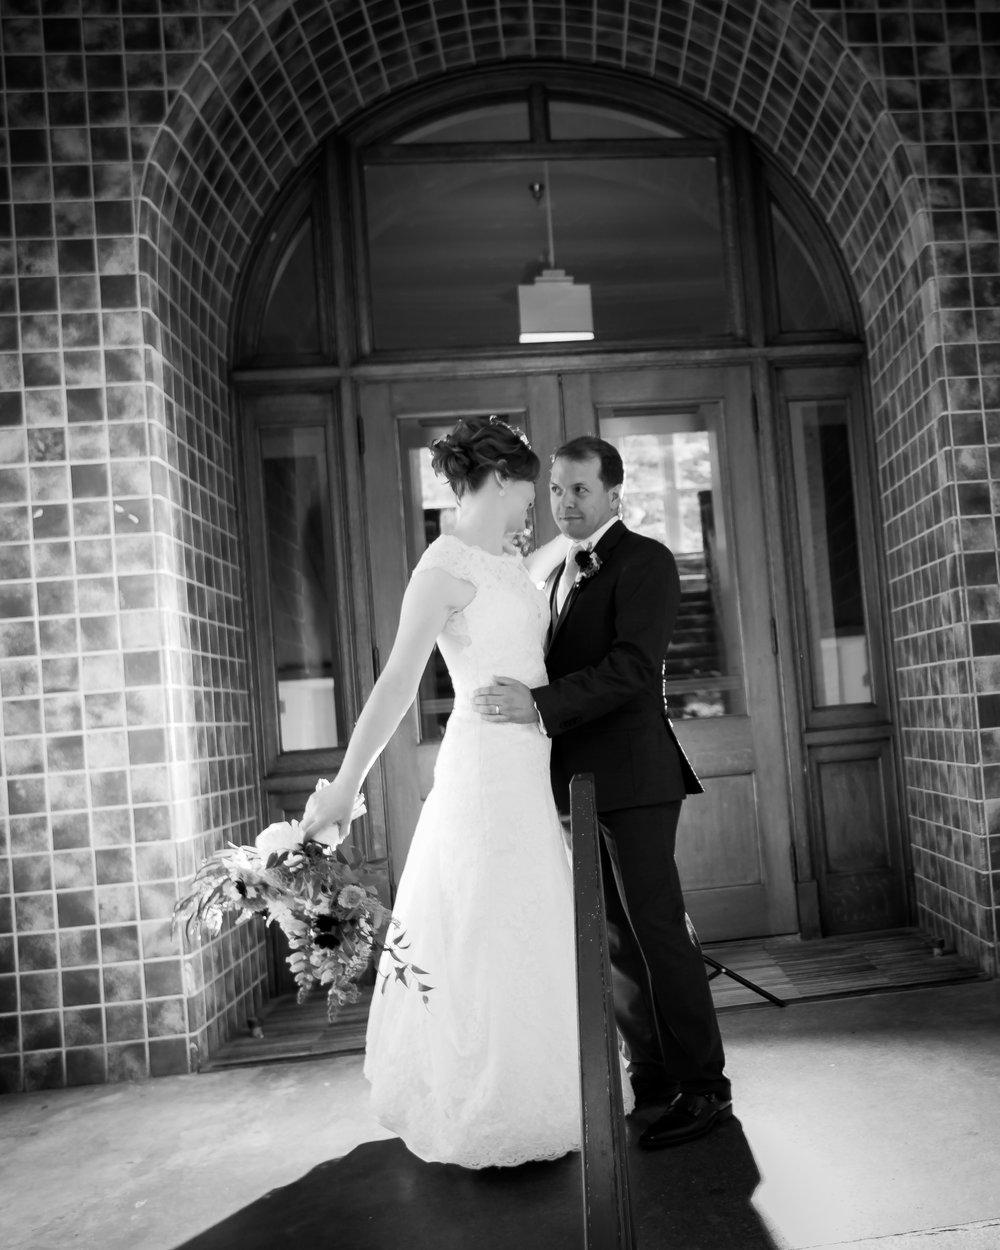 AndrewBrownPhotography-Weddings-60.jpg